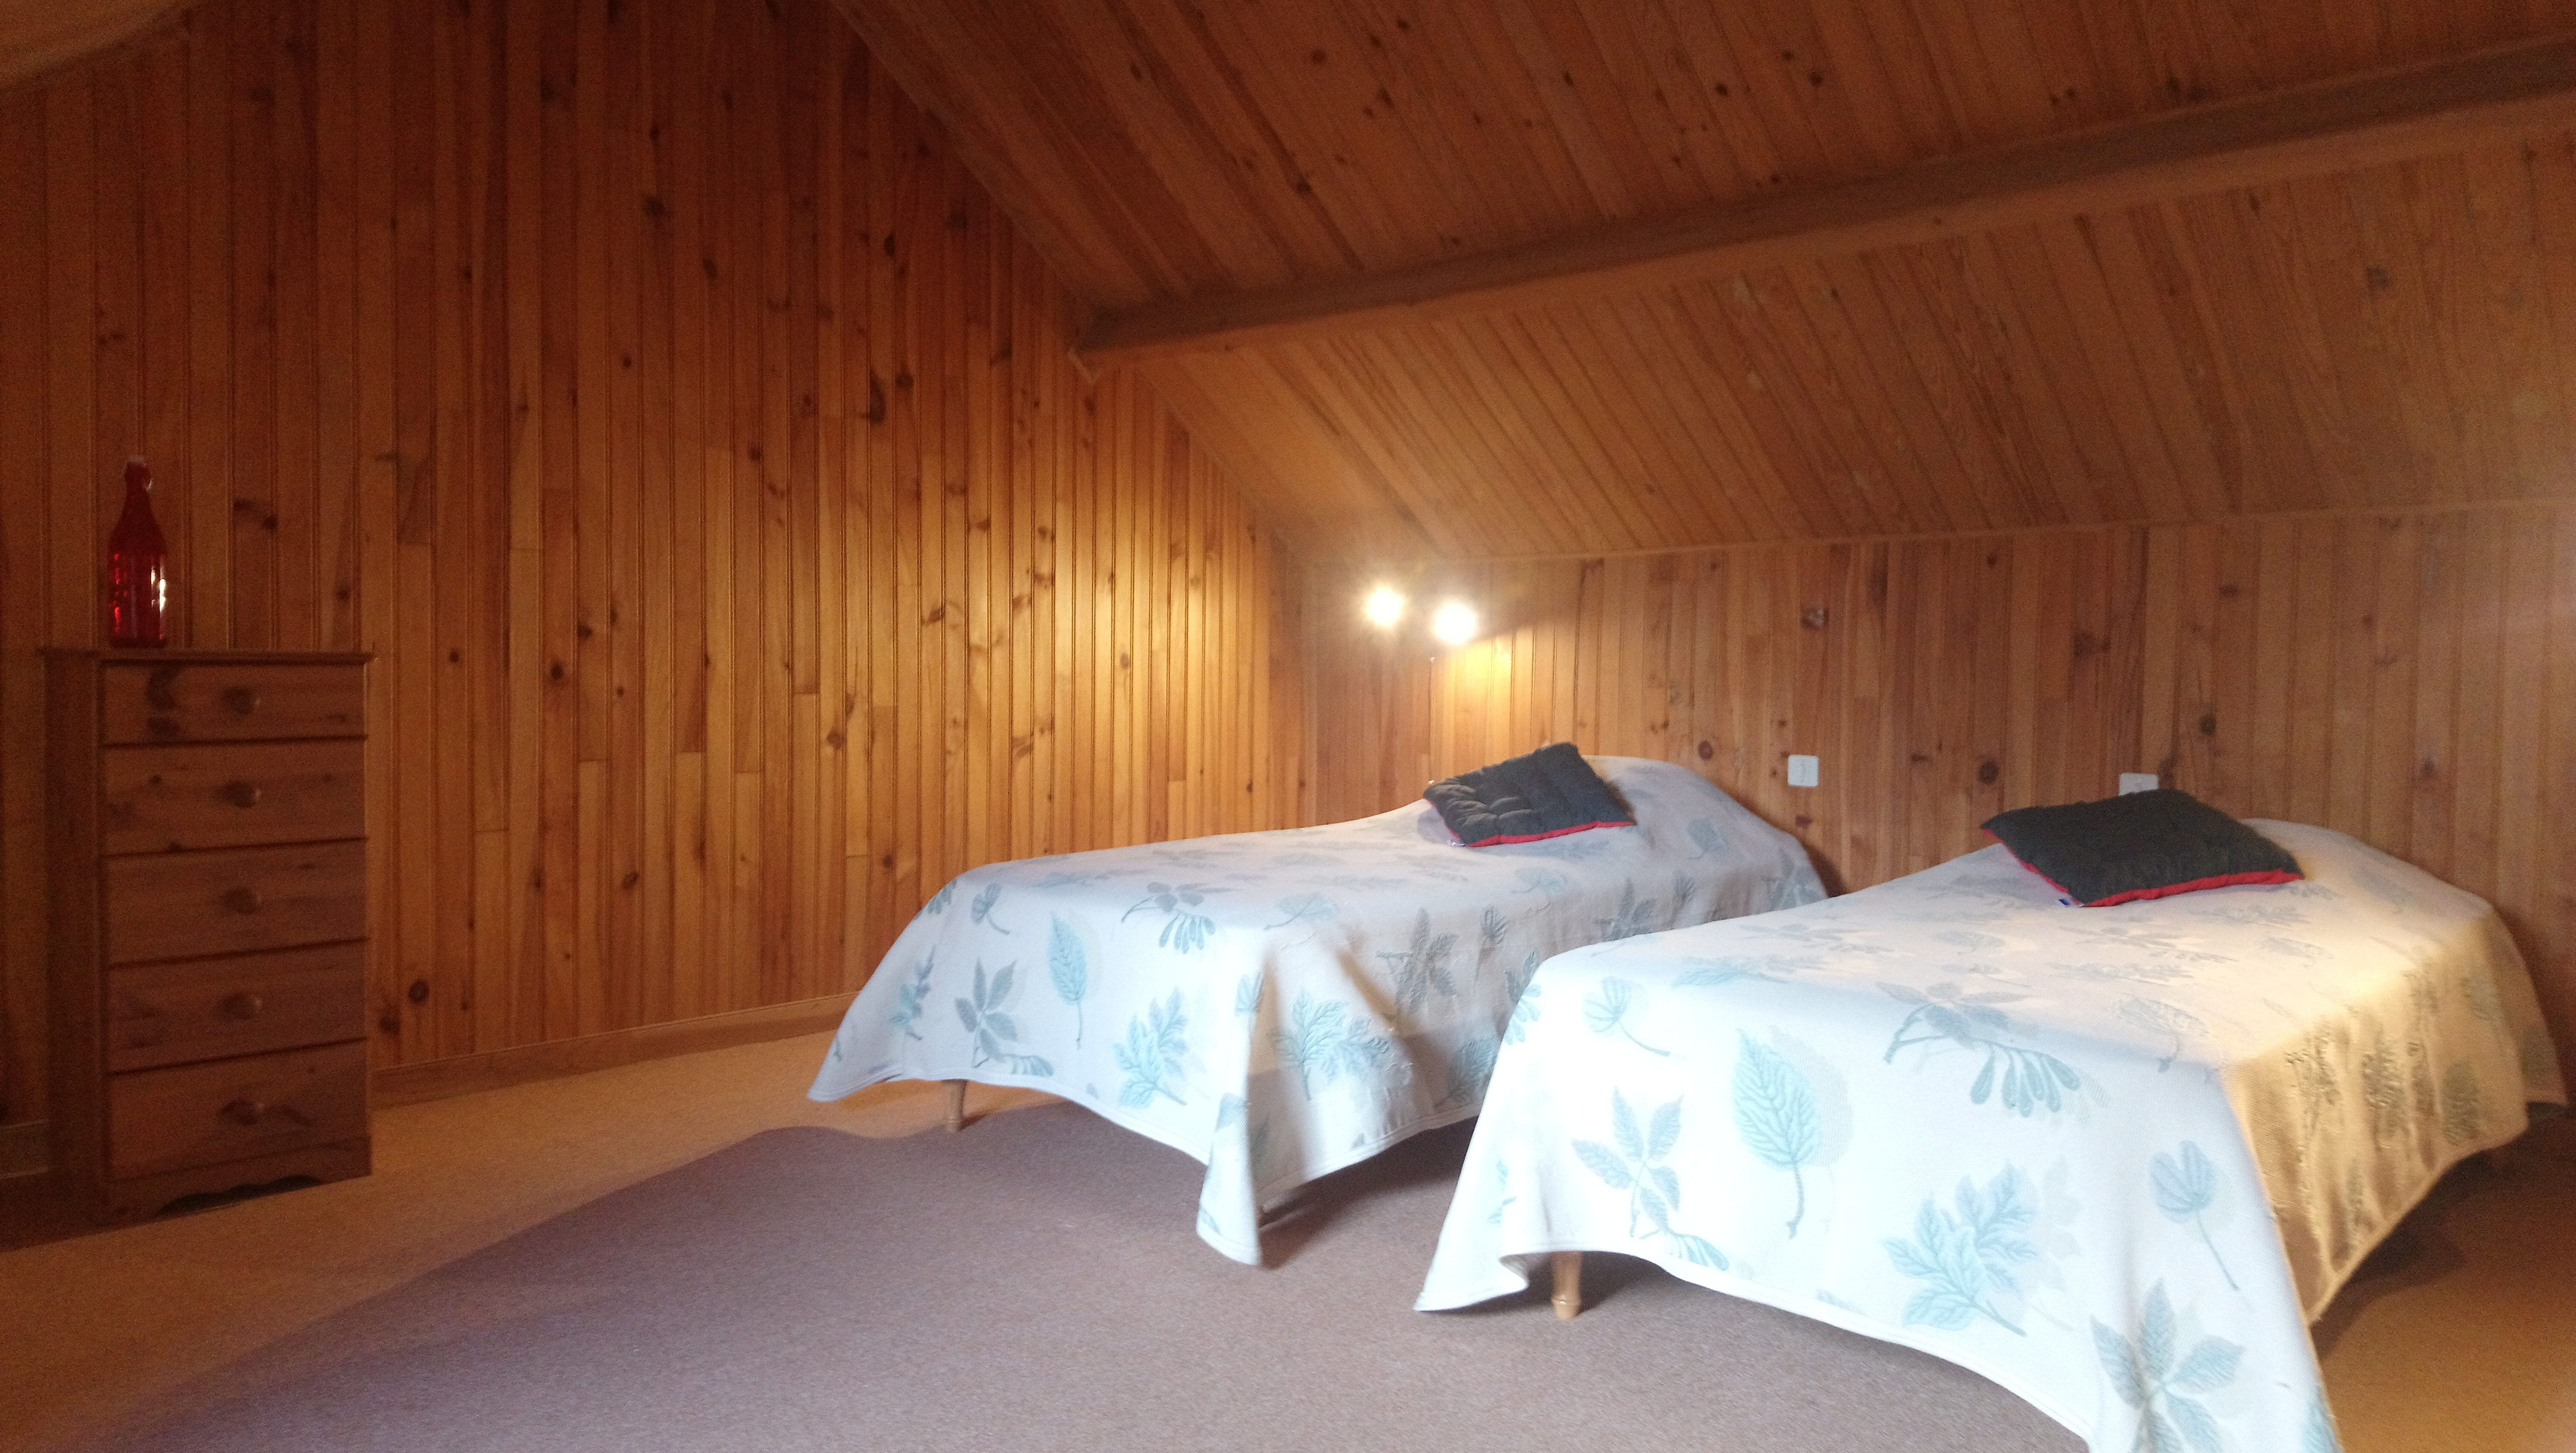 chambre_n°2_avec_2_lits_simples_confort.